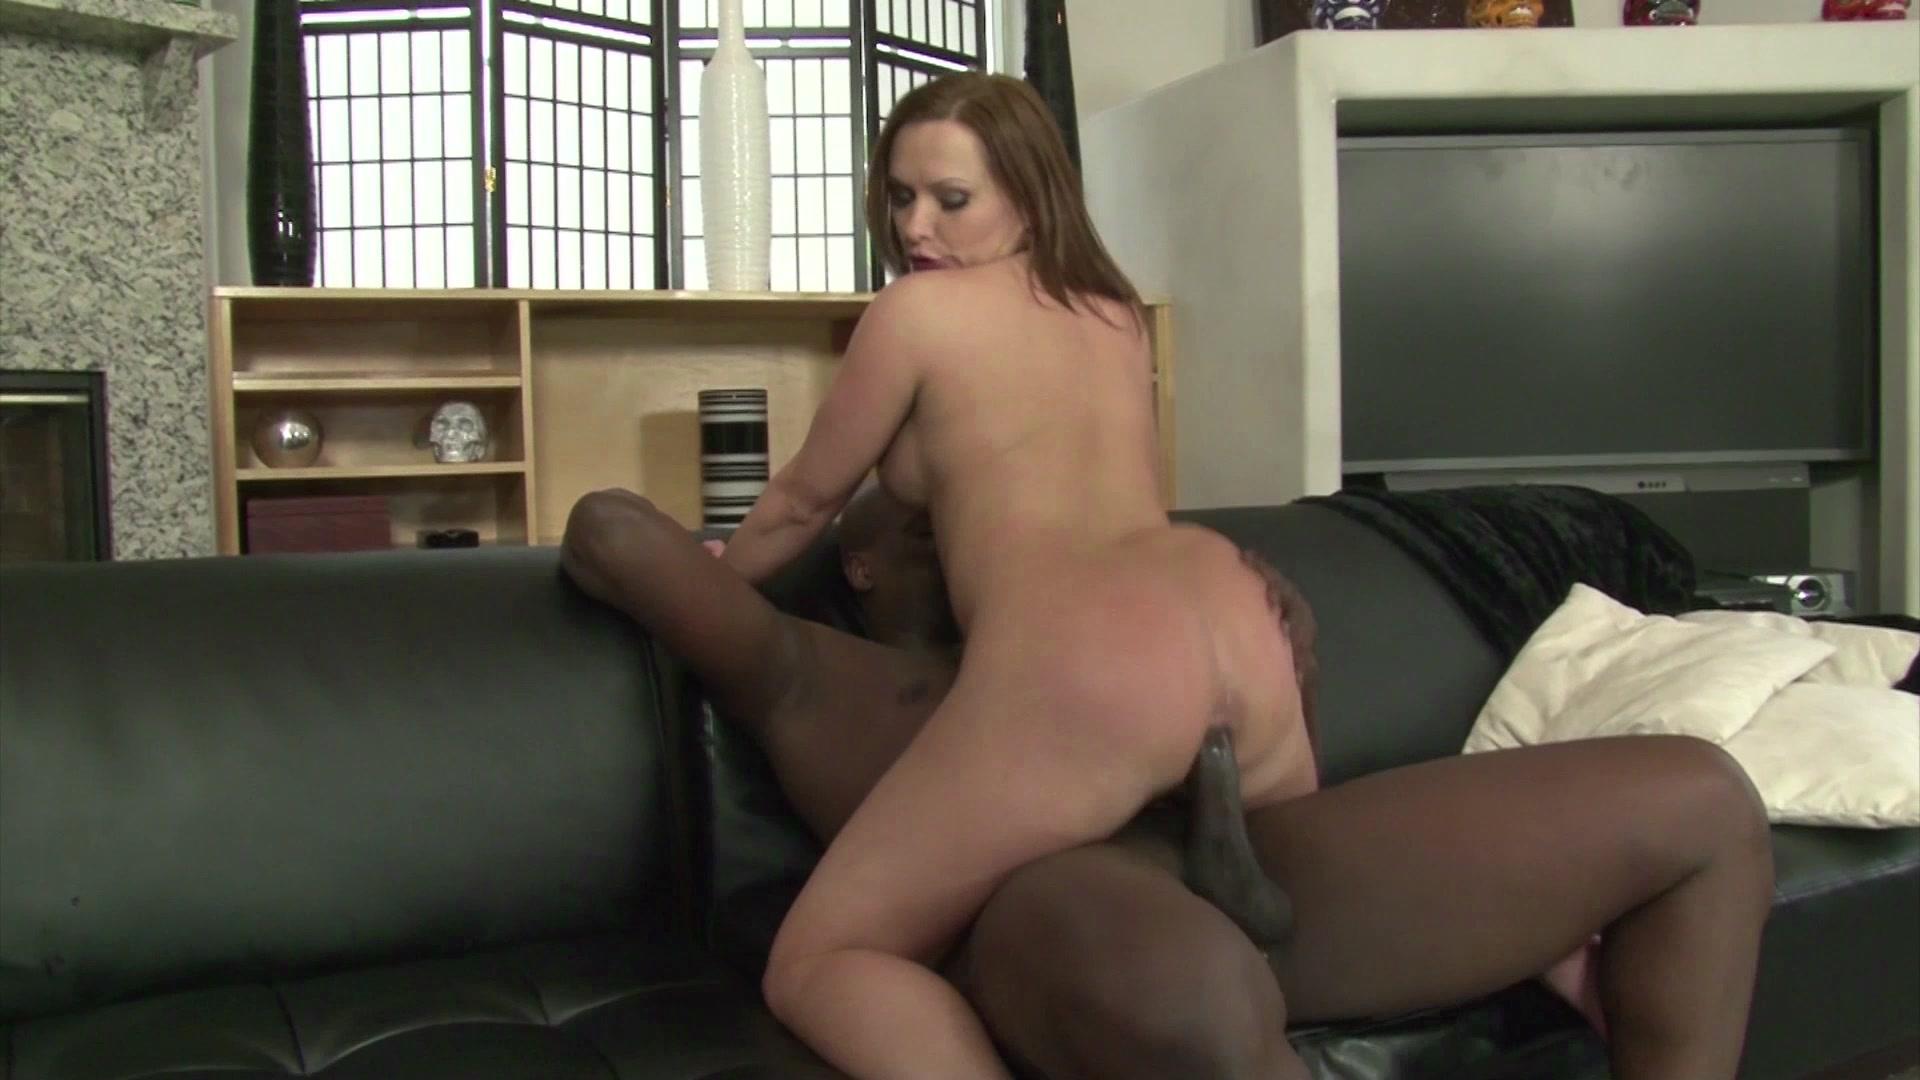 PAWG Katja Kassin Loves the Taste and Feel of Chocolate Dick HD porn video scene.